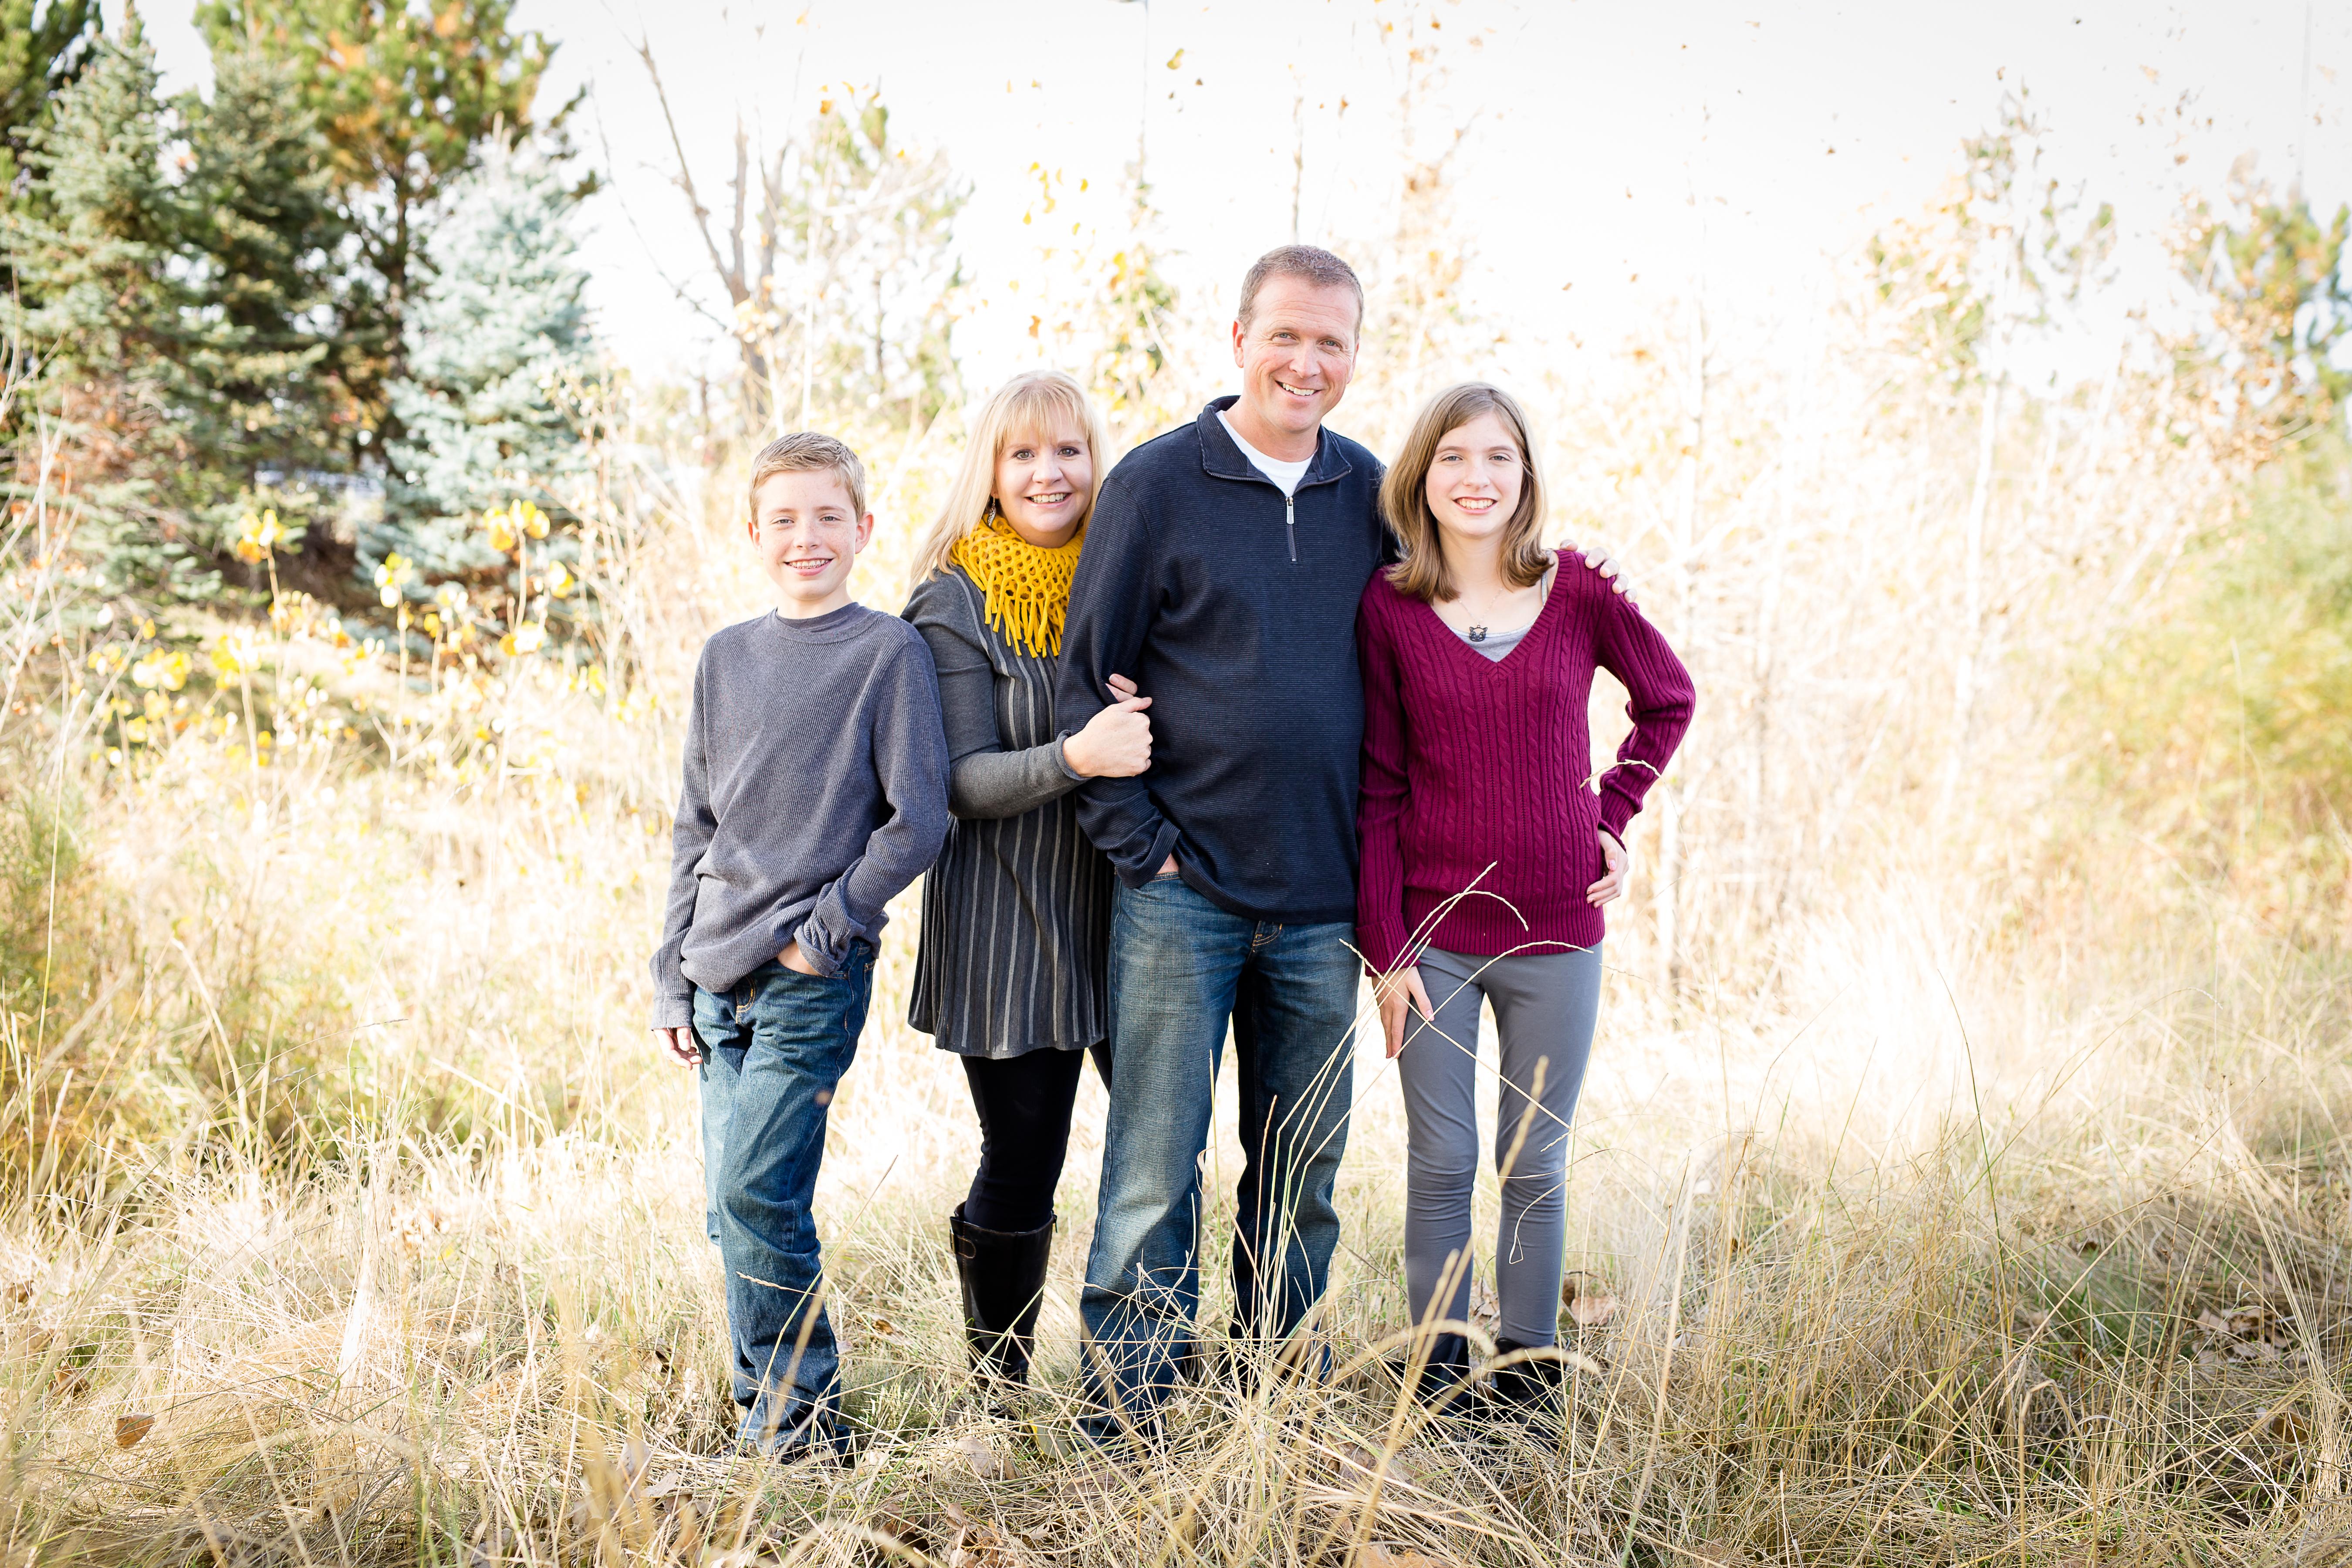 Loveland Family Photography